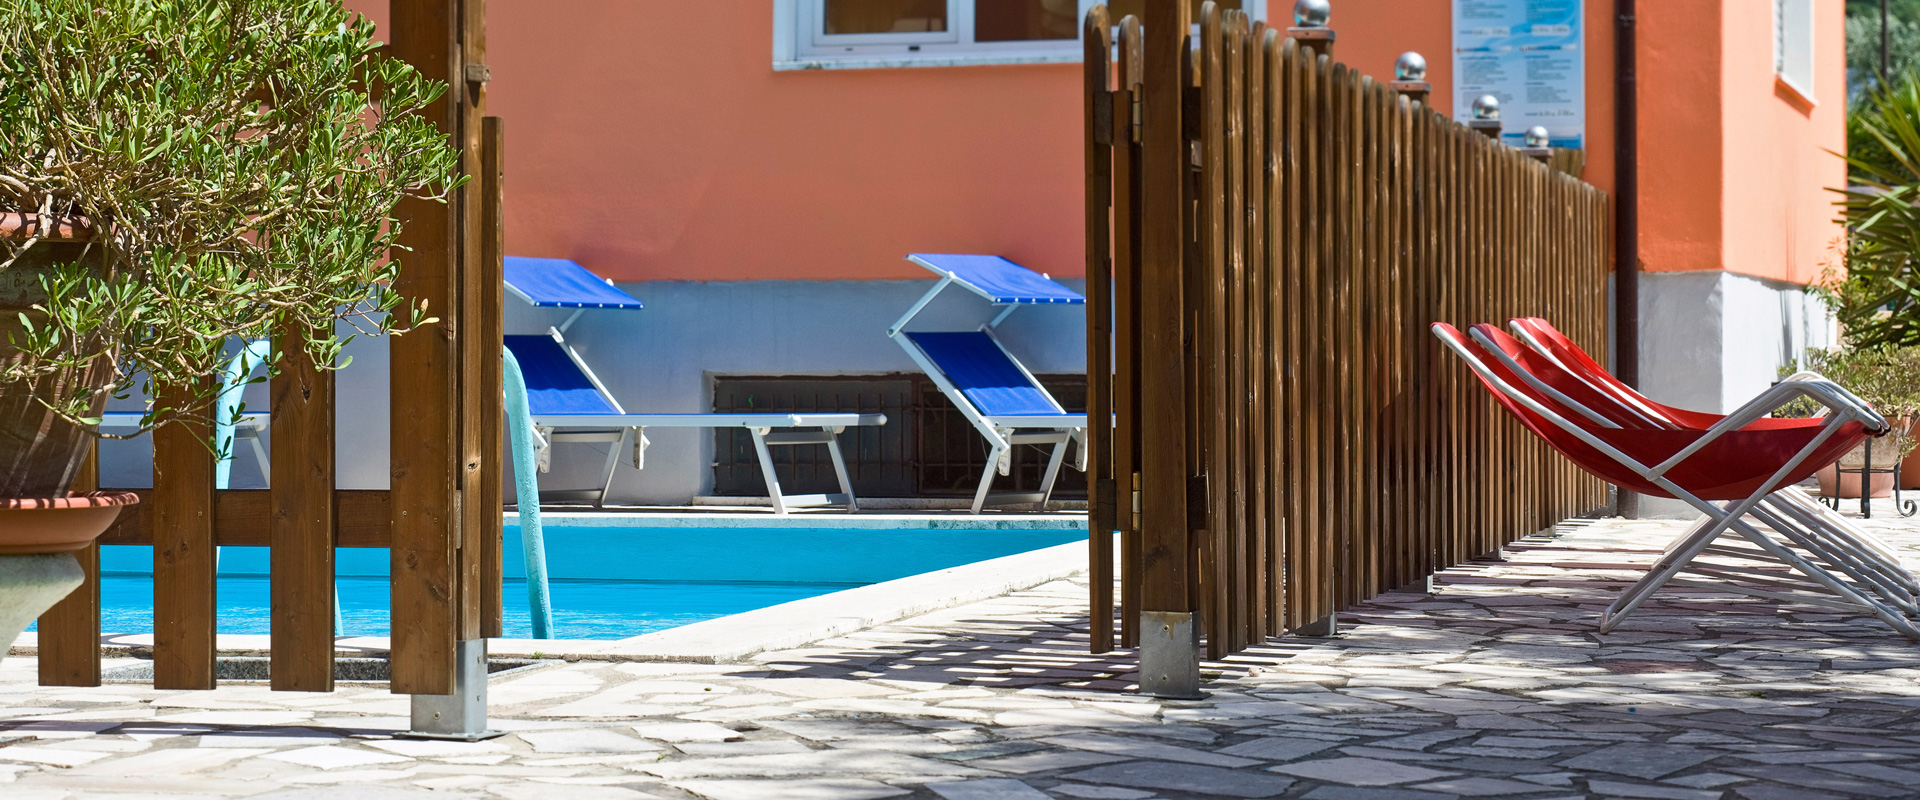 Villa Mimosa - B&B - Torbole sul Garda - Pool